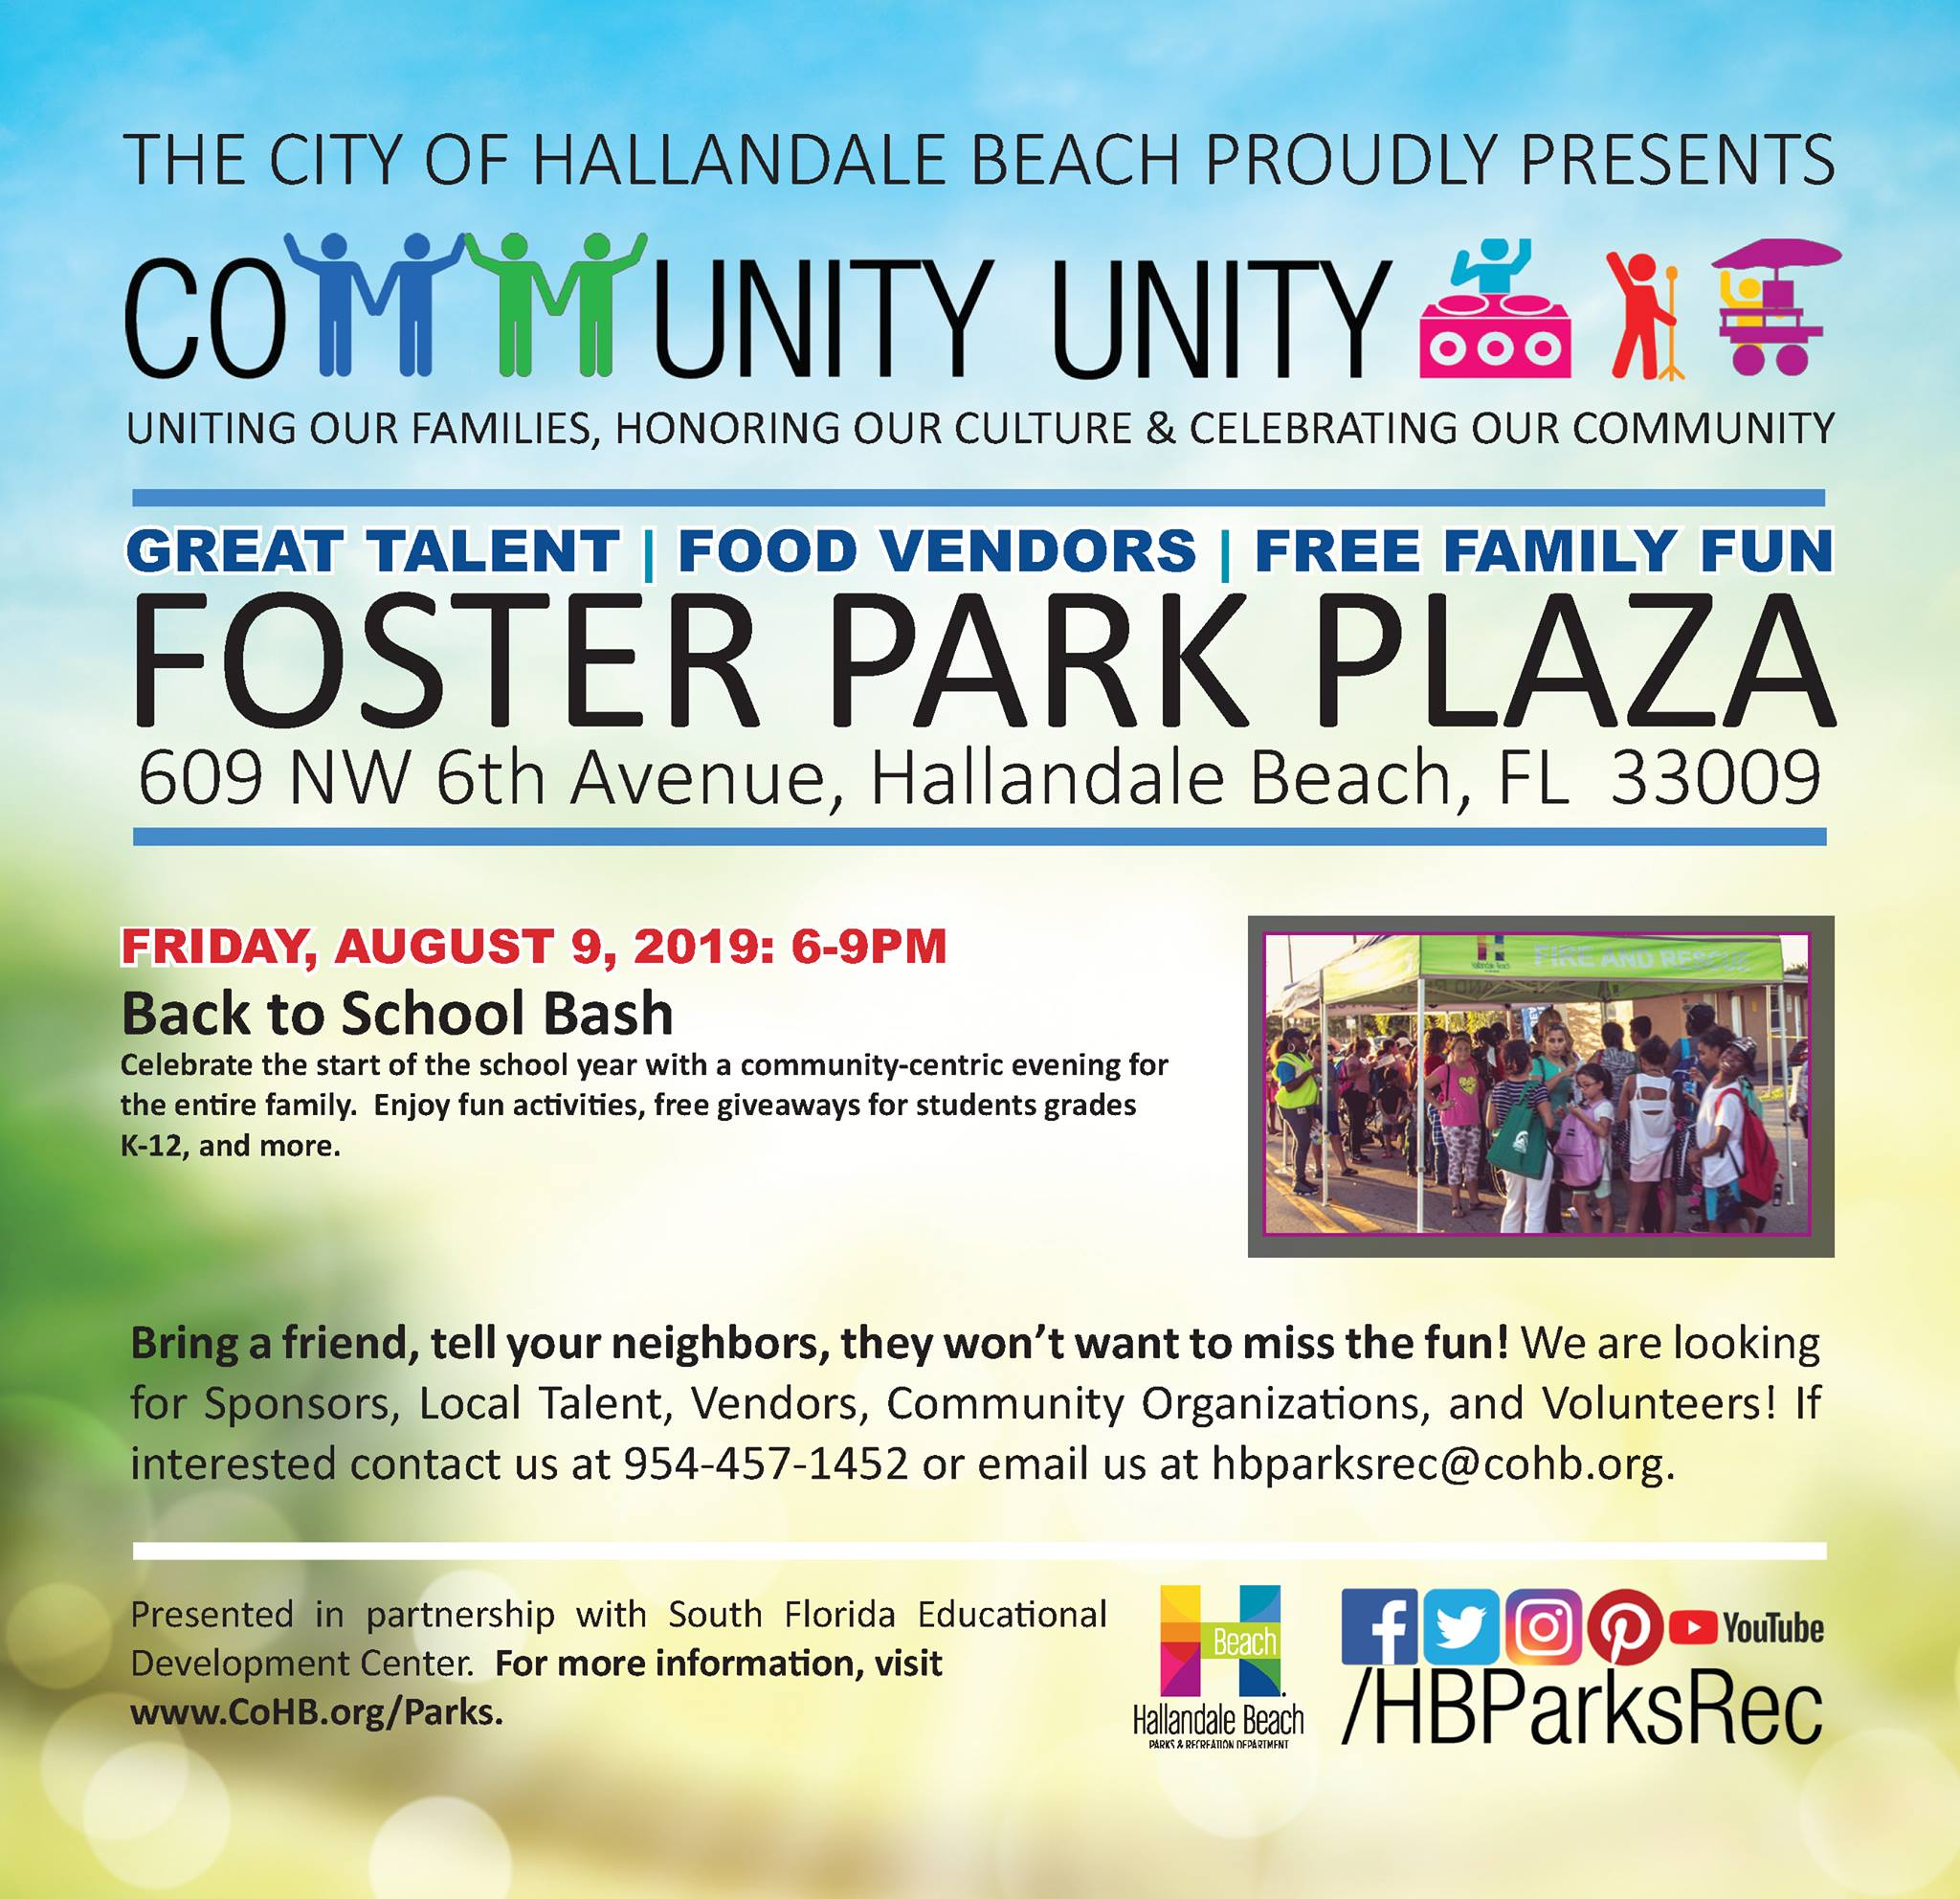 Hallandale Beach, FL - Official Website